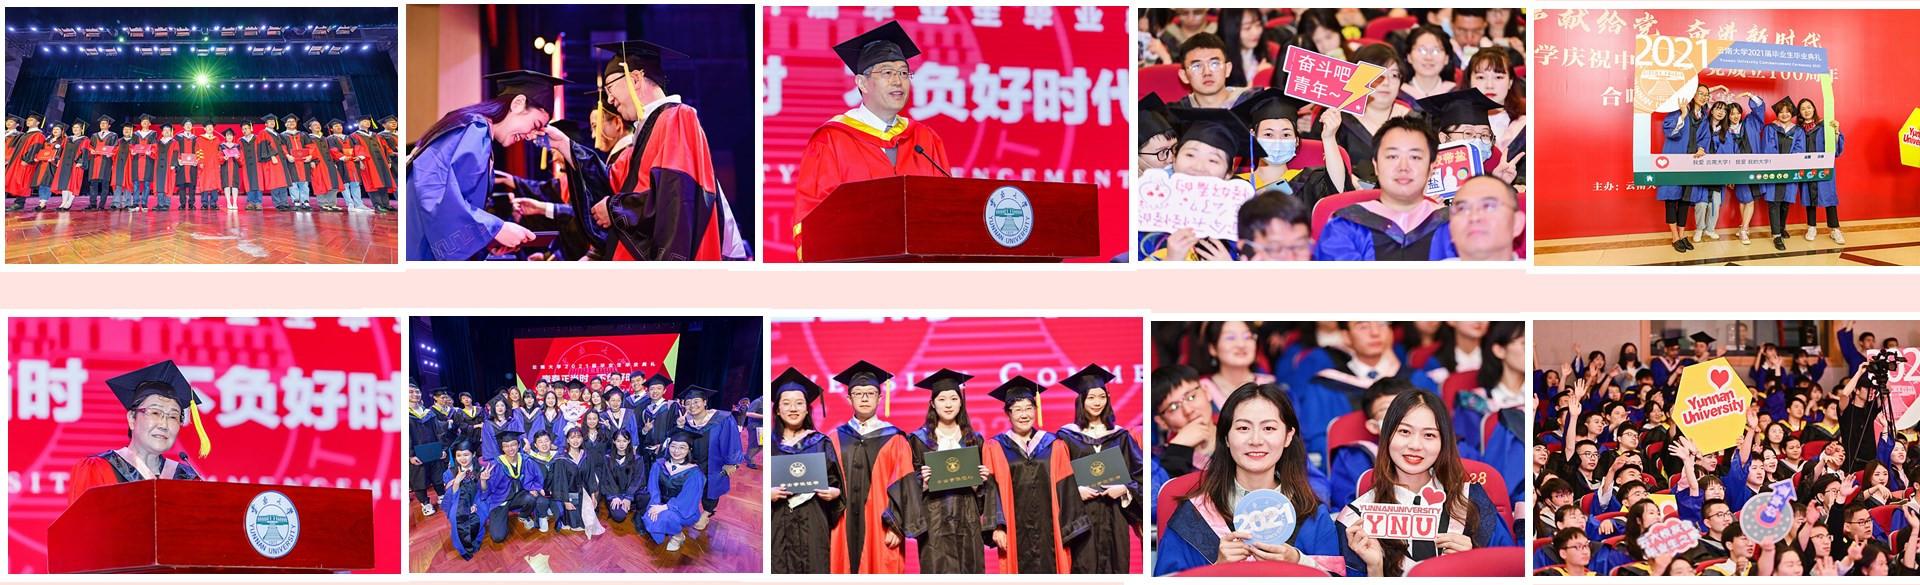 YNU holds 2021 graduation ceremony